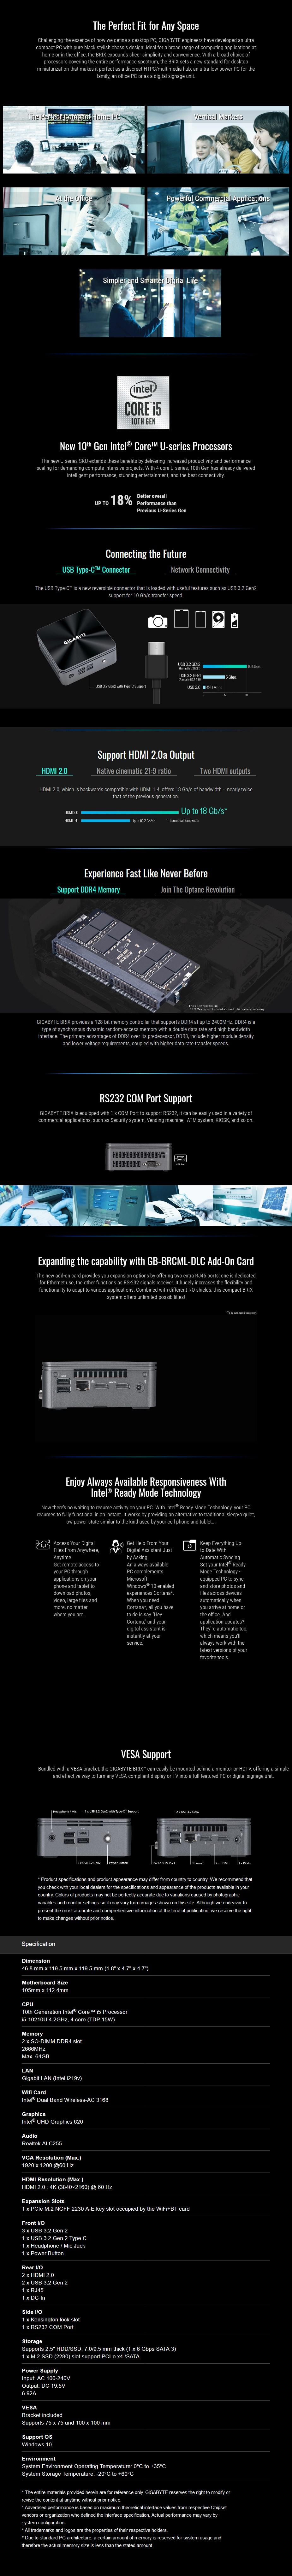 gigabyte-brix-gbbri5h10210-barebone-kit-intel-i510210u-processor-ac37552-7.jpg